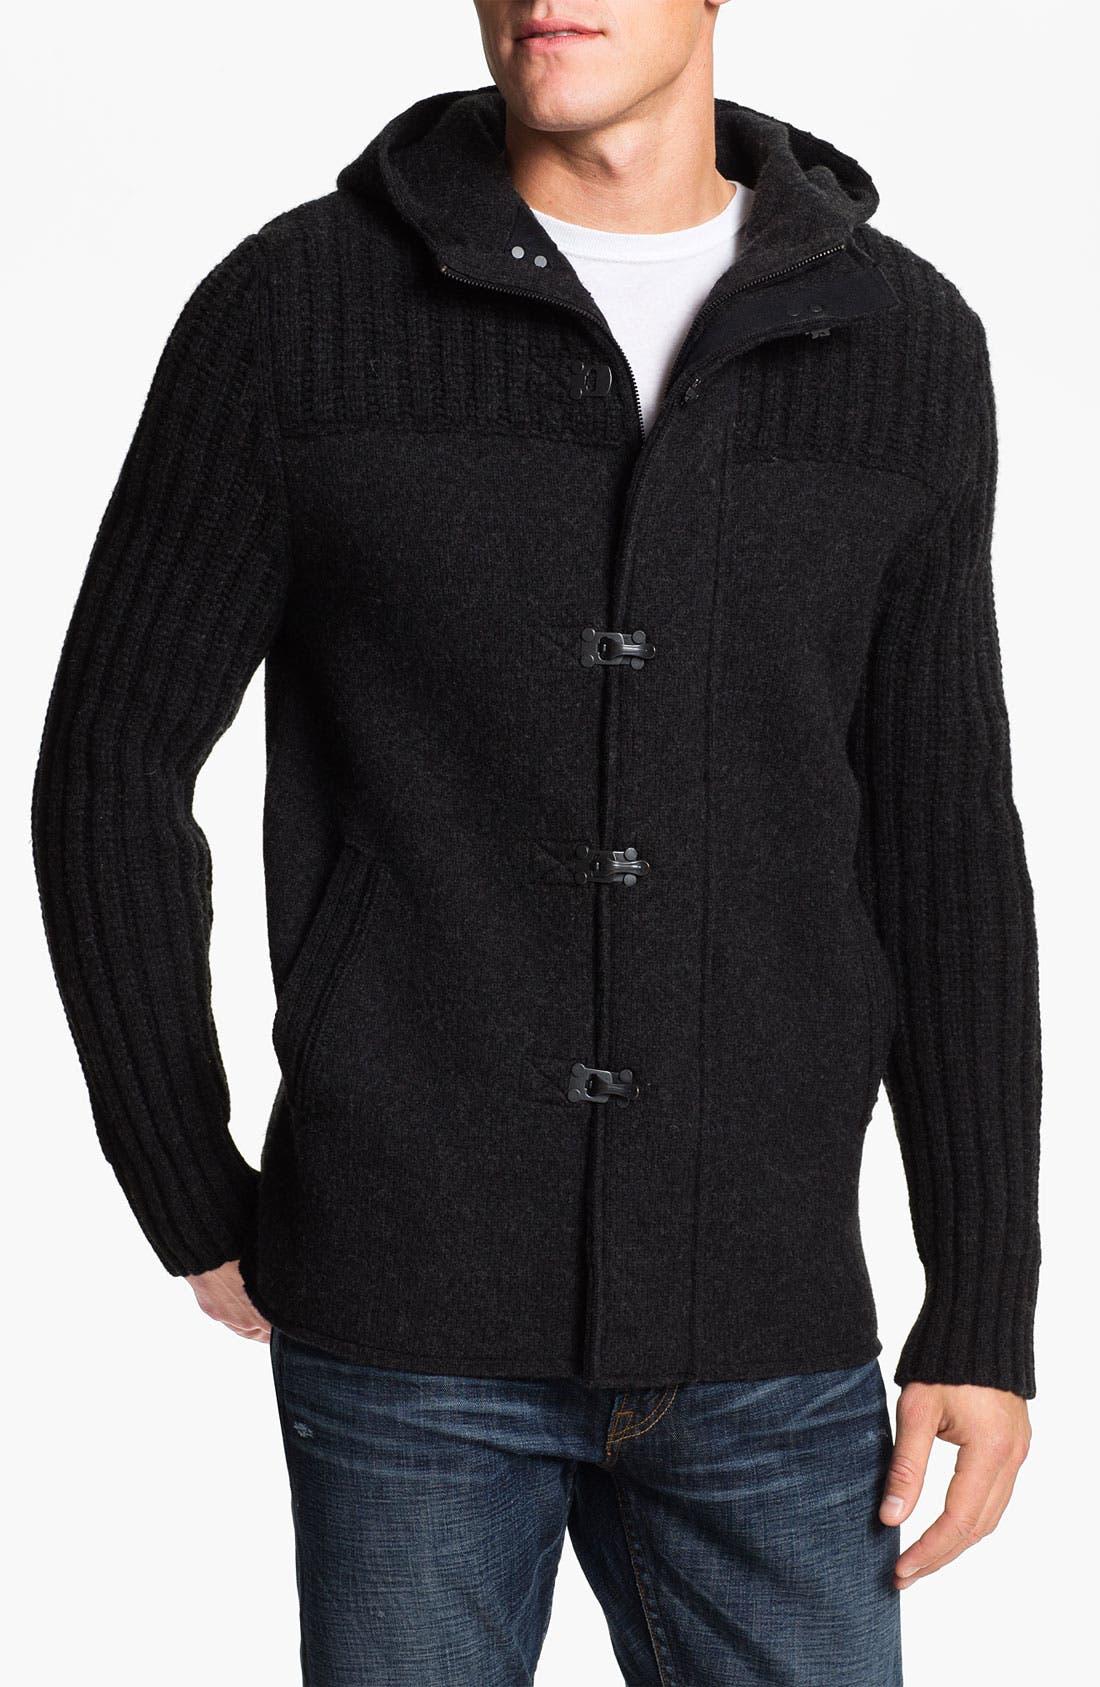 Alternate Image 1 Selected - BOSS Orange 'Kristen' Wool Hooded Sweater